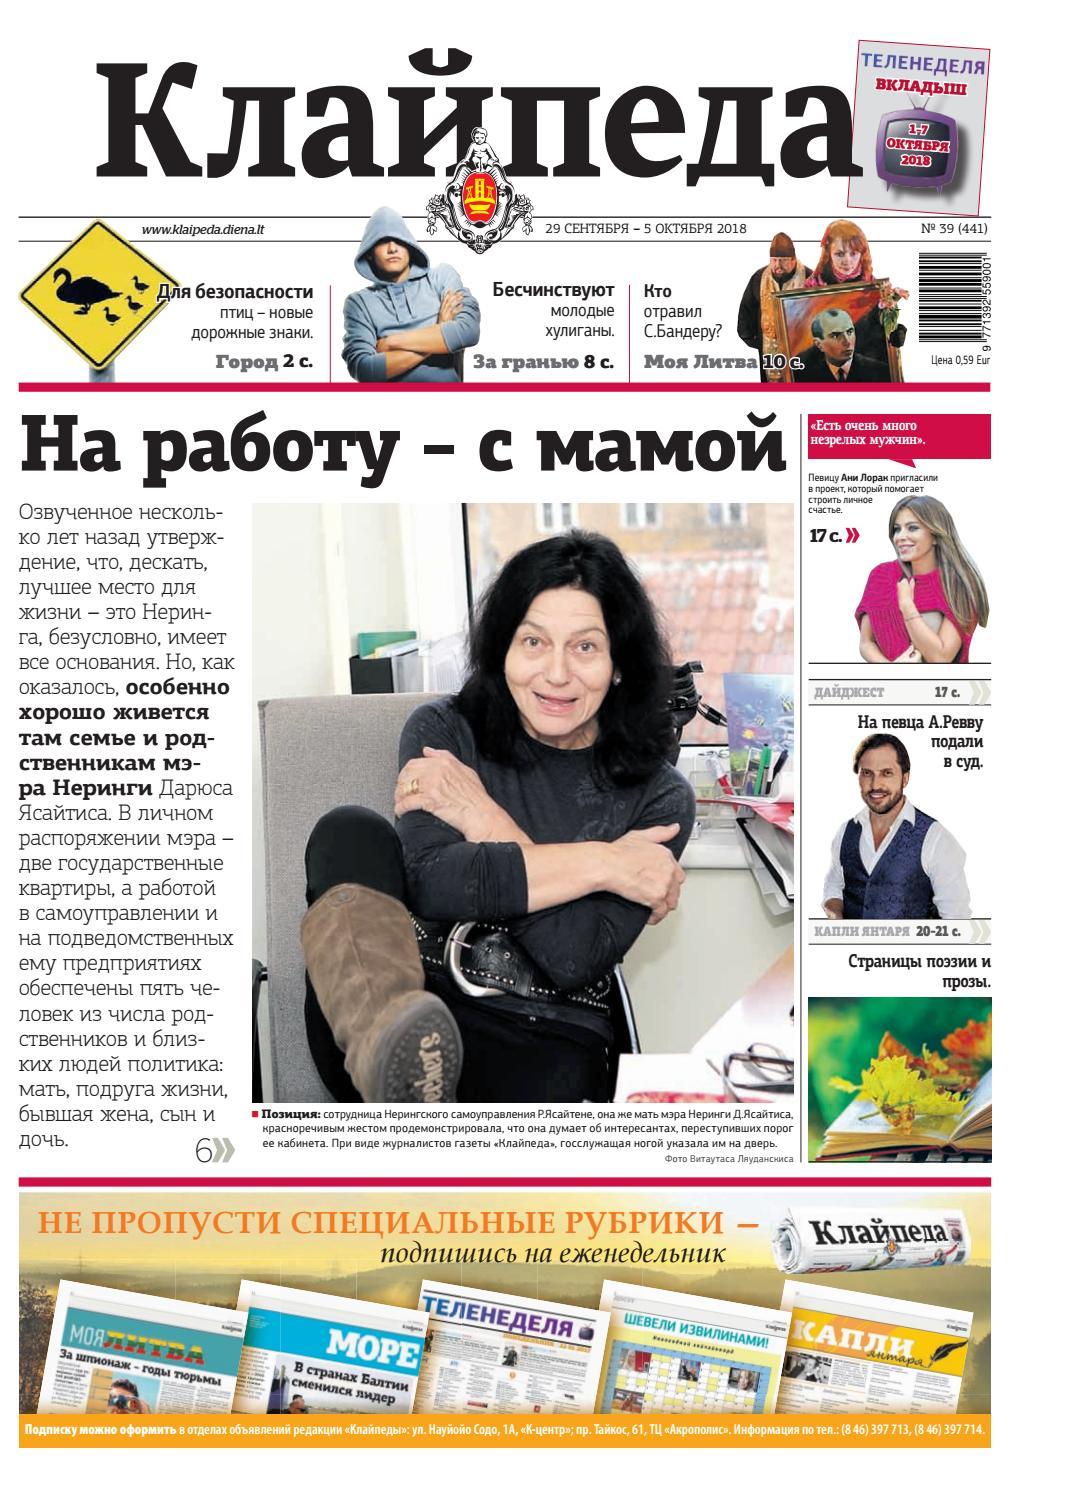 2e4ec8b7d 2018-09-29 Klaipėda RUS by Diena Media News - issuu